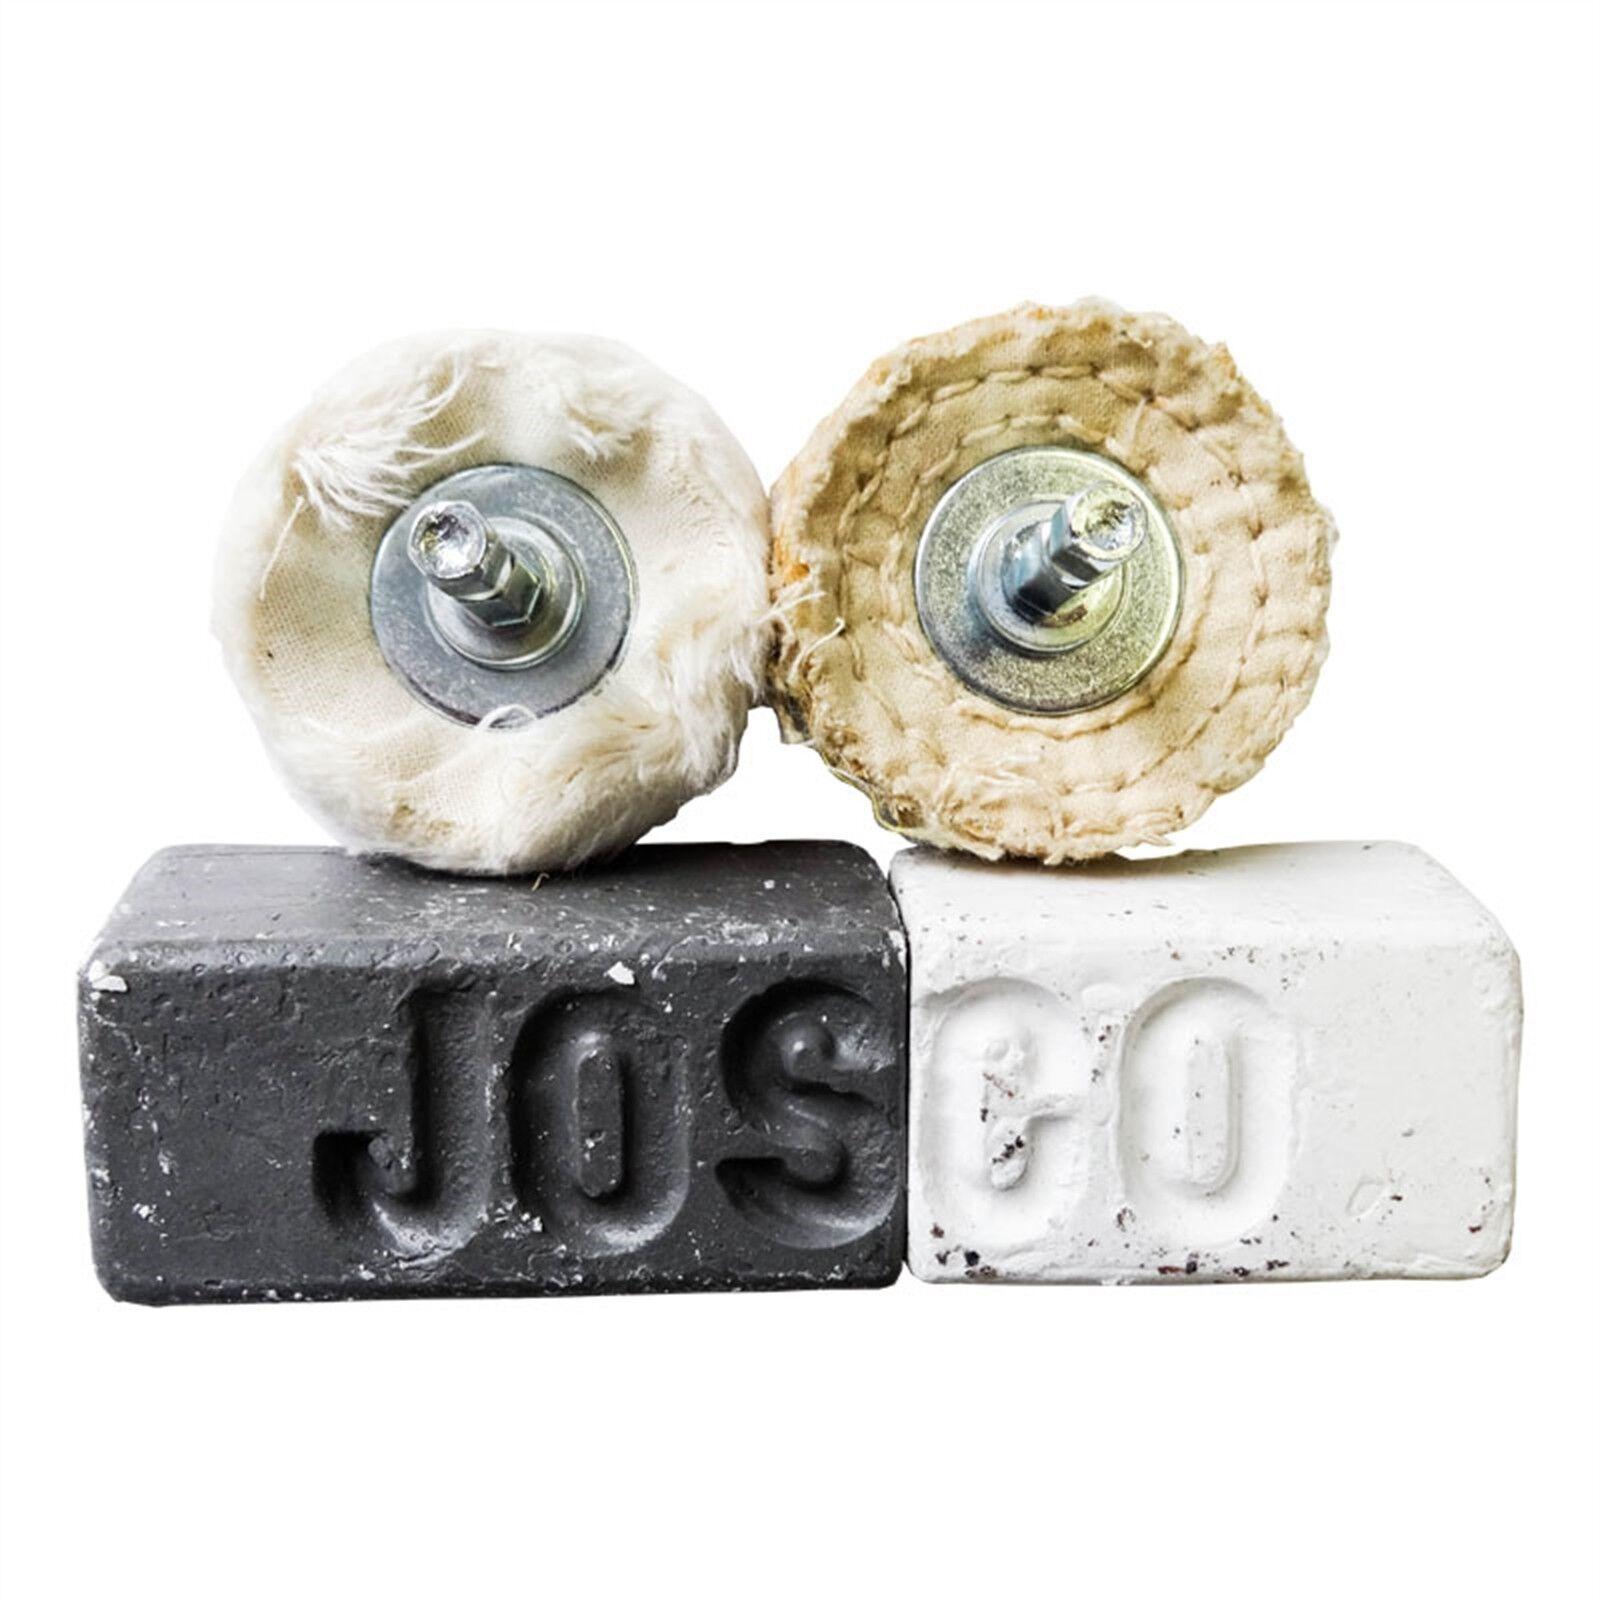 Josco METAL POLISHING KIT JPK1 Sisal & Calico Buff, Fastcut & SS Compound